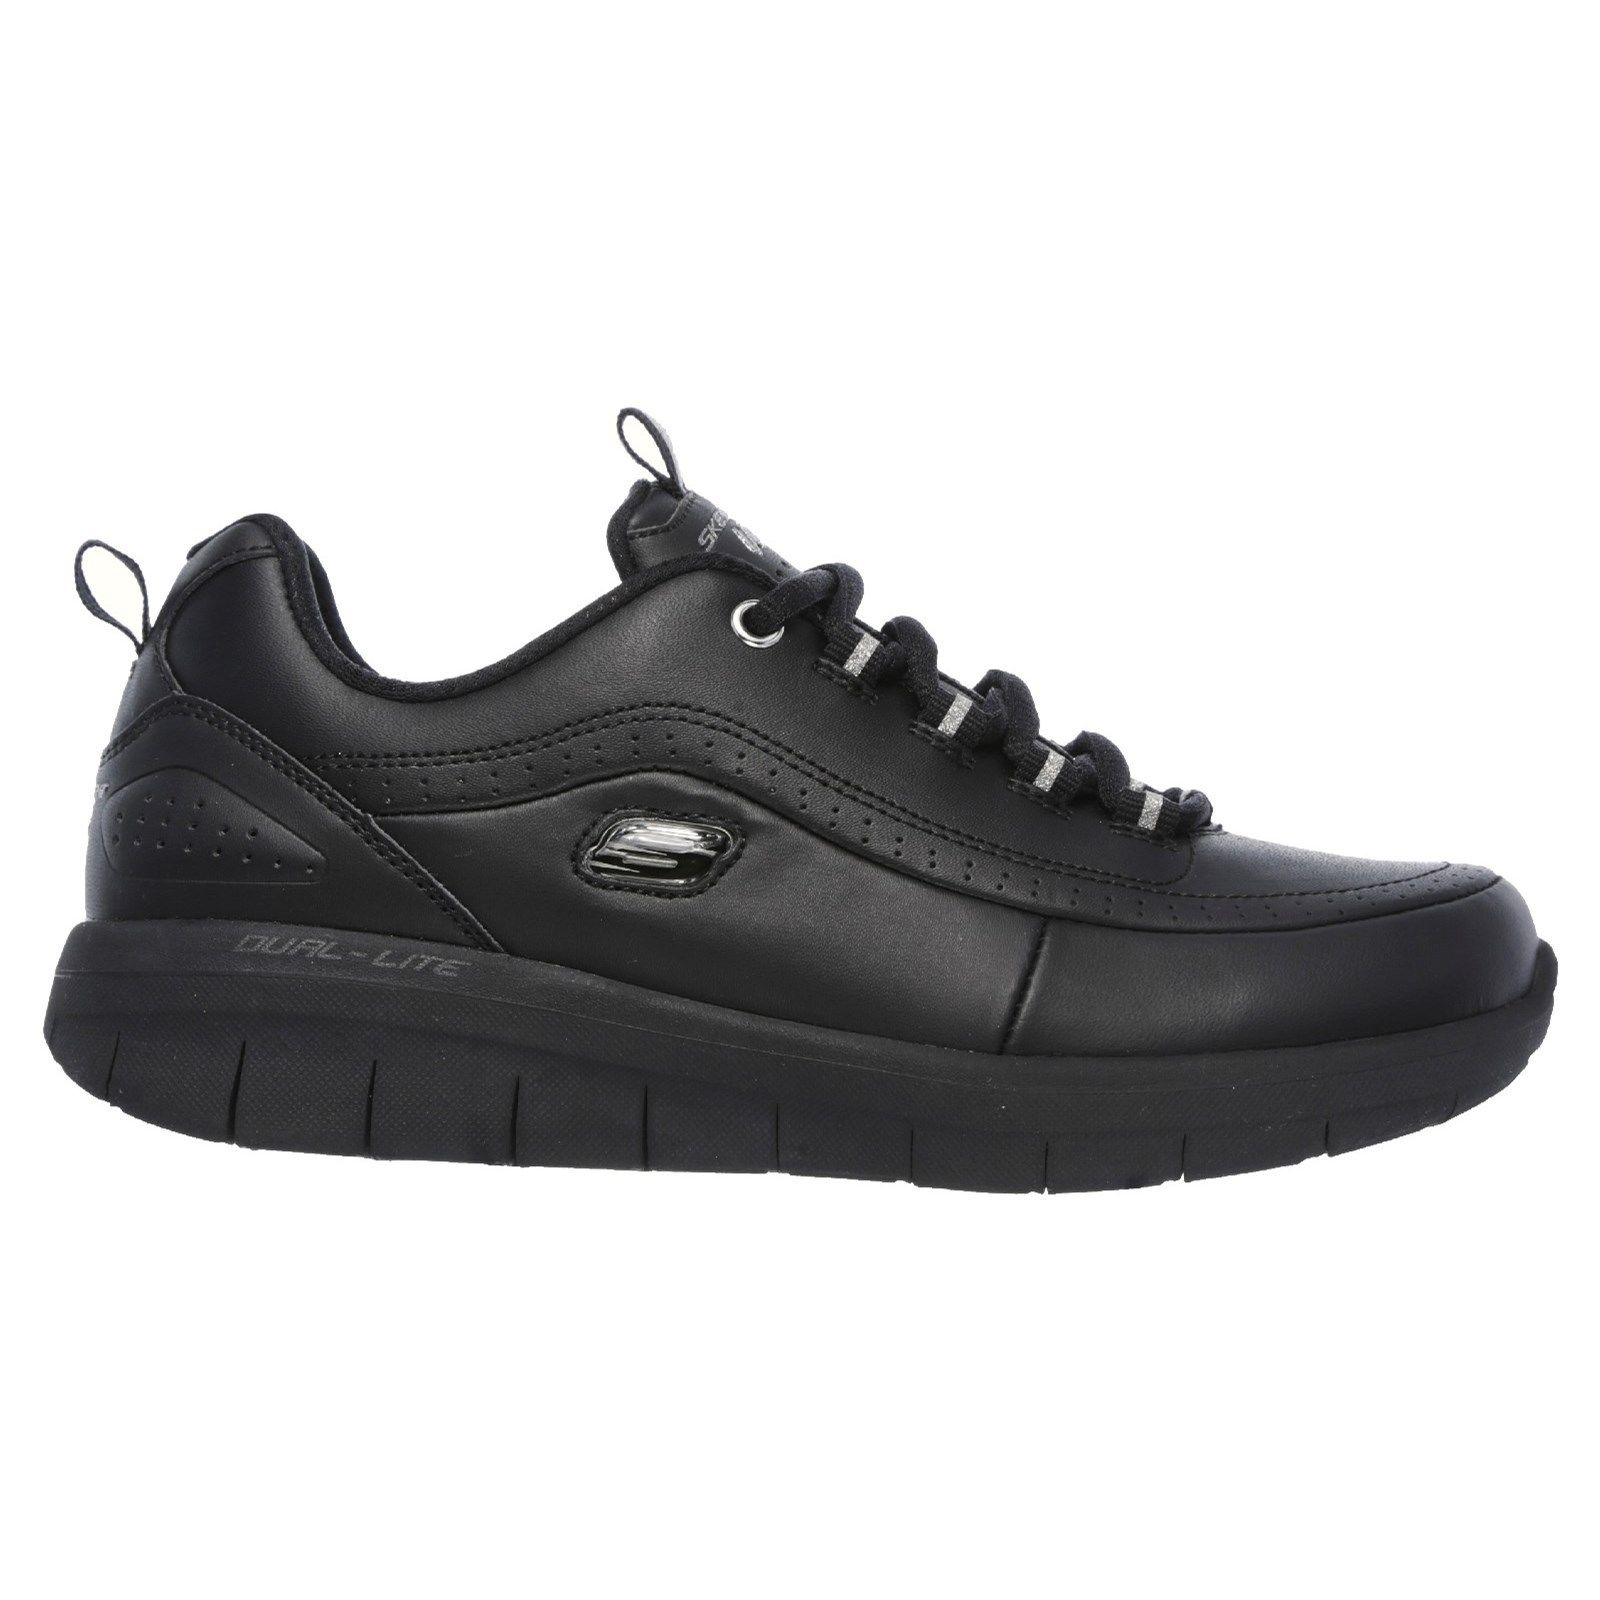 Skechers-Zapatillas-deportivas-Synergy-2-0-para-mujer-senora-FS4430 miniatura 6